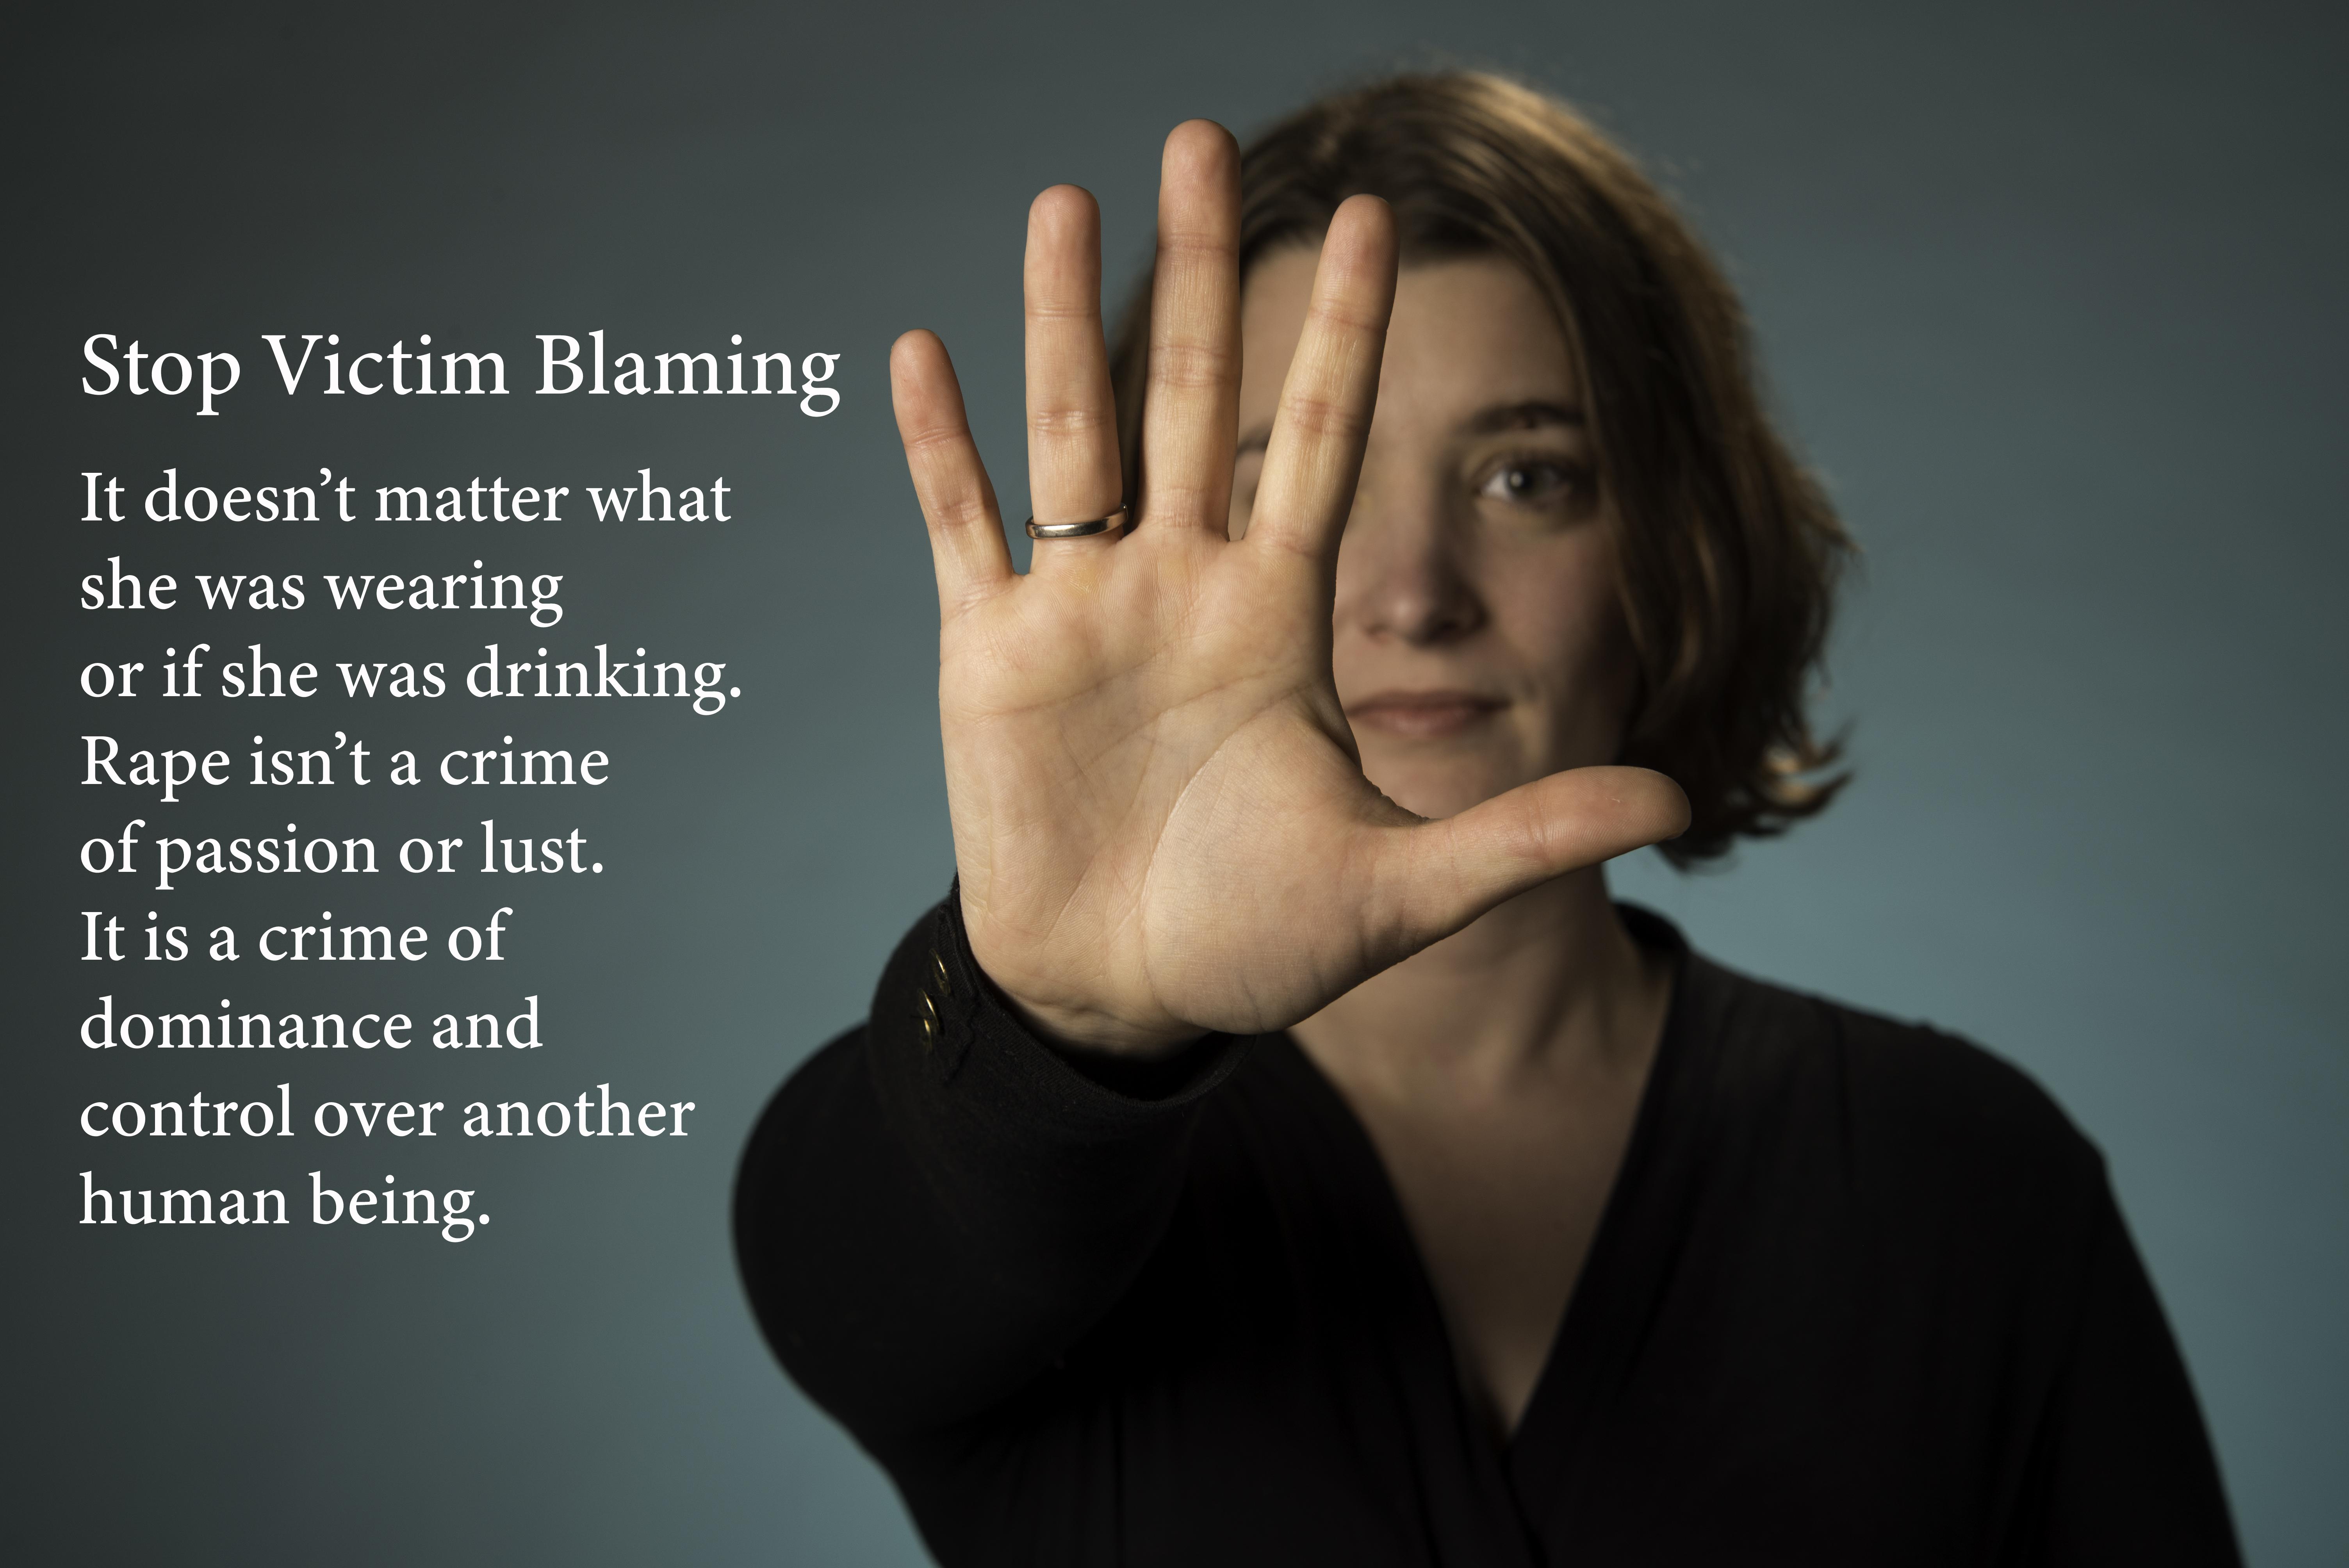 Stop Victim Blaming